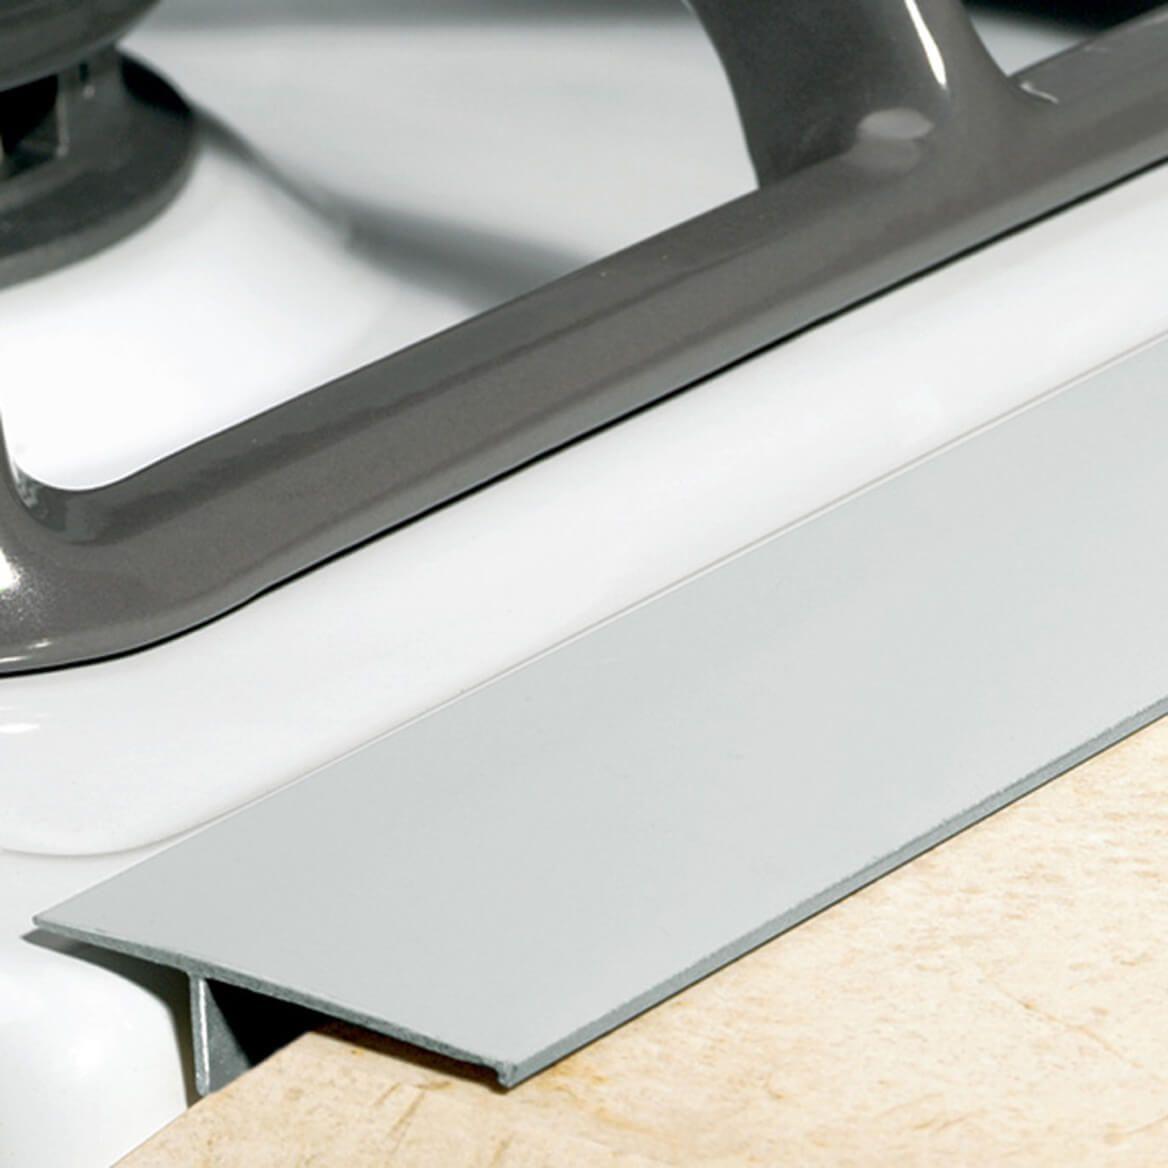 Gap Cap for Stovetops - Aluminum - Set of 2-355291